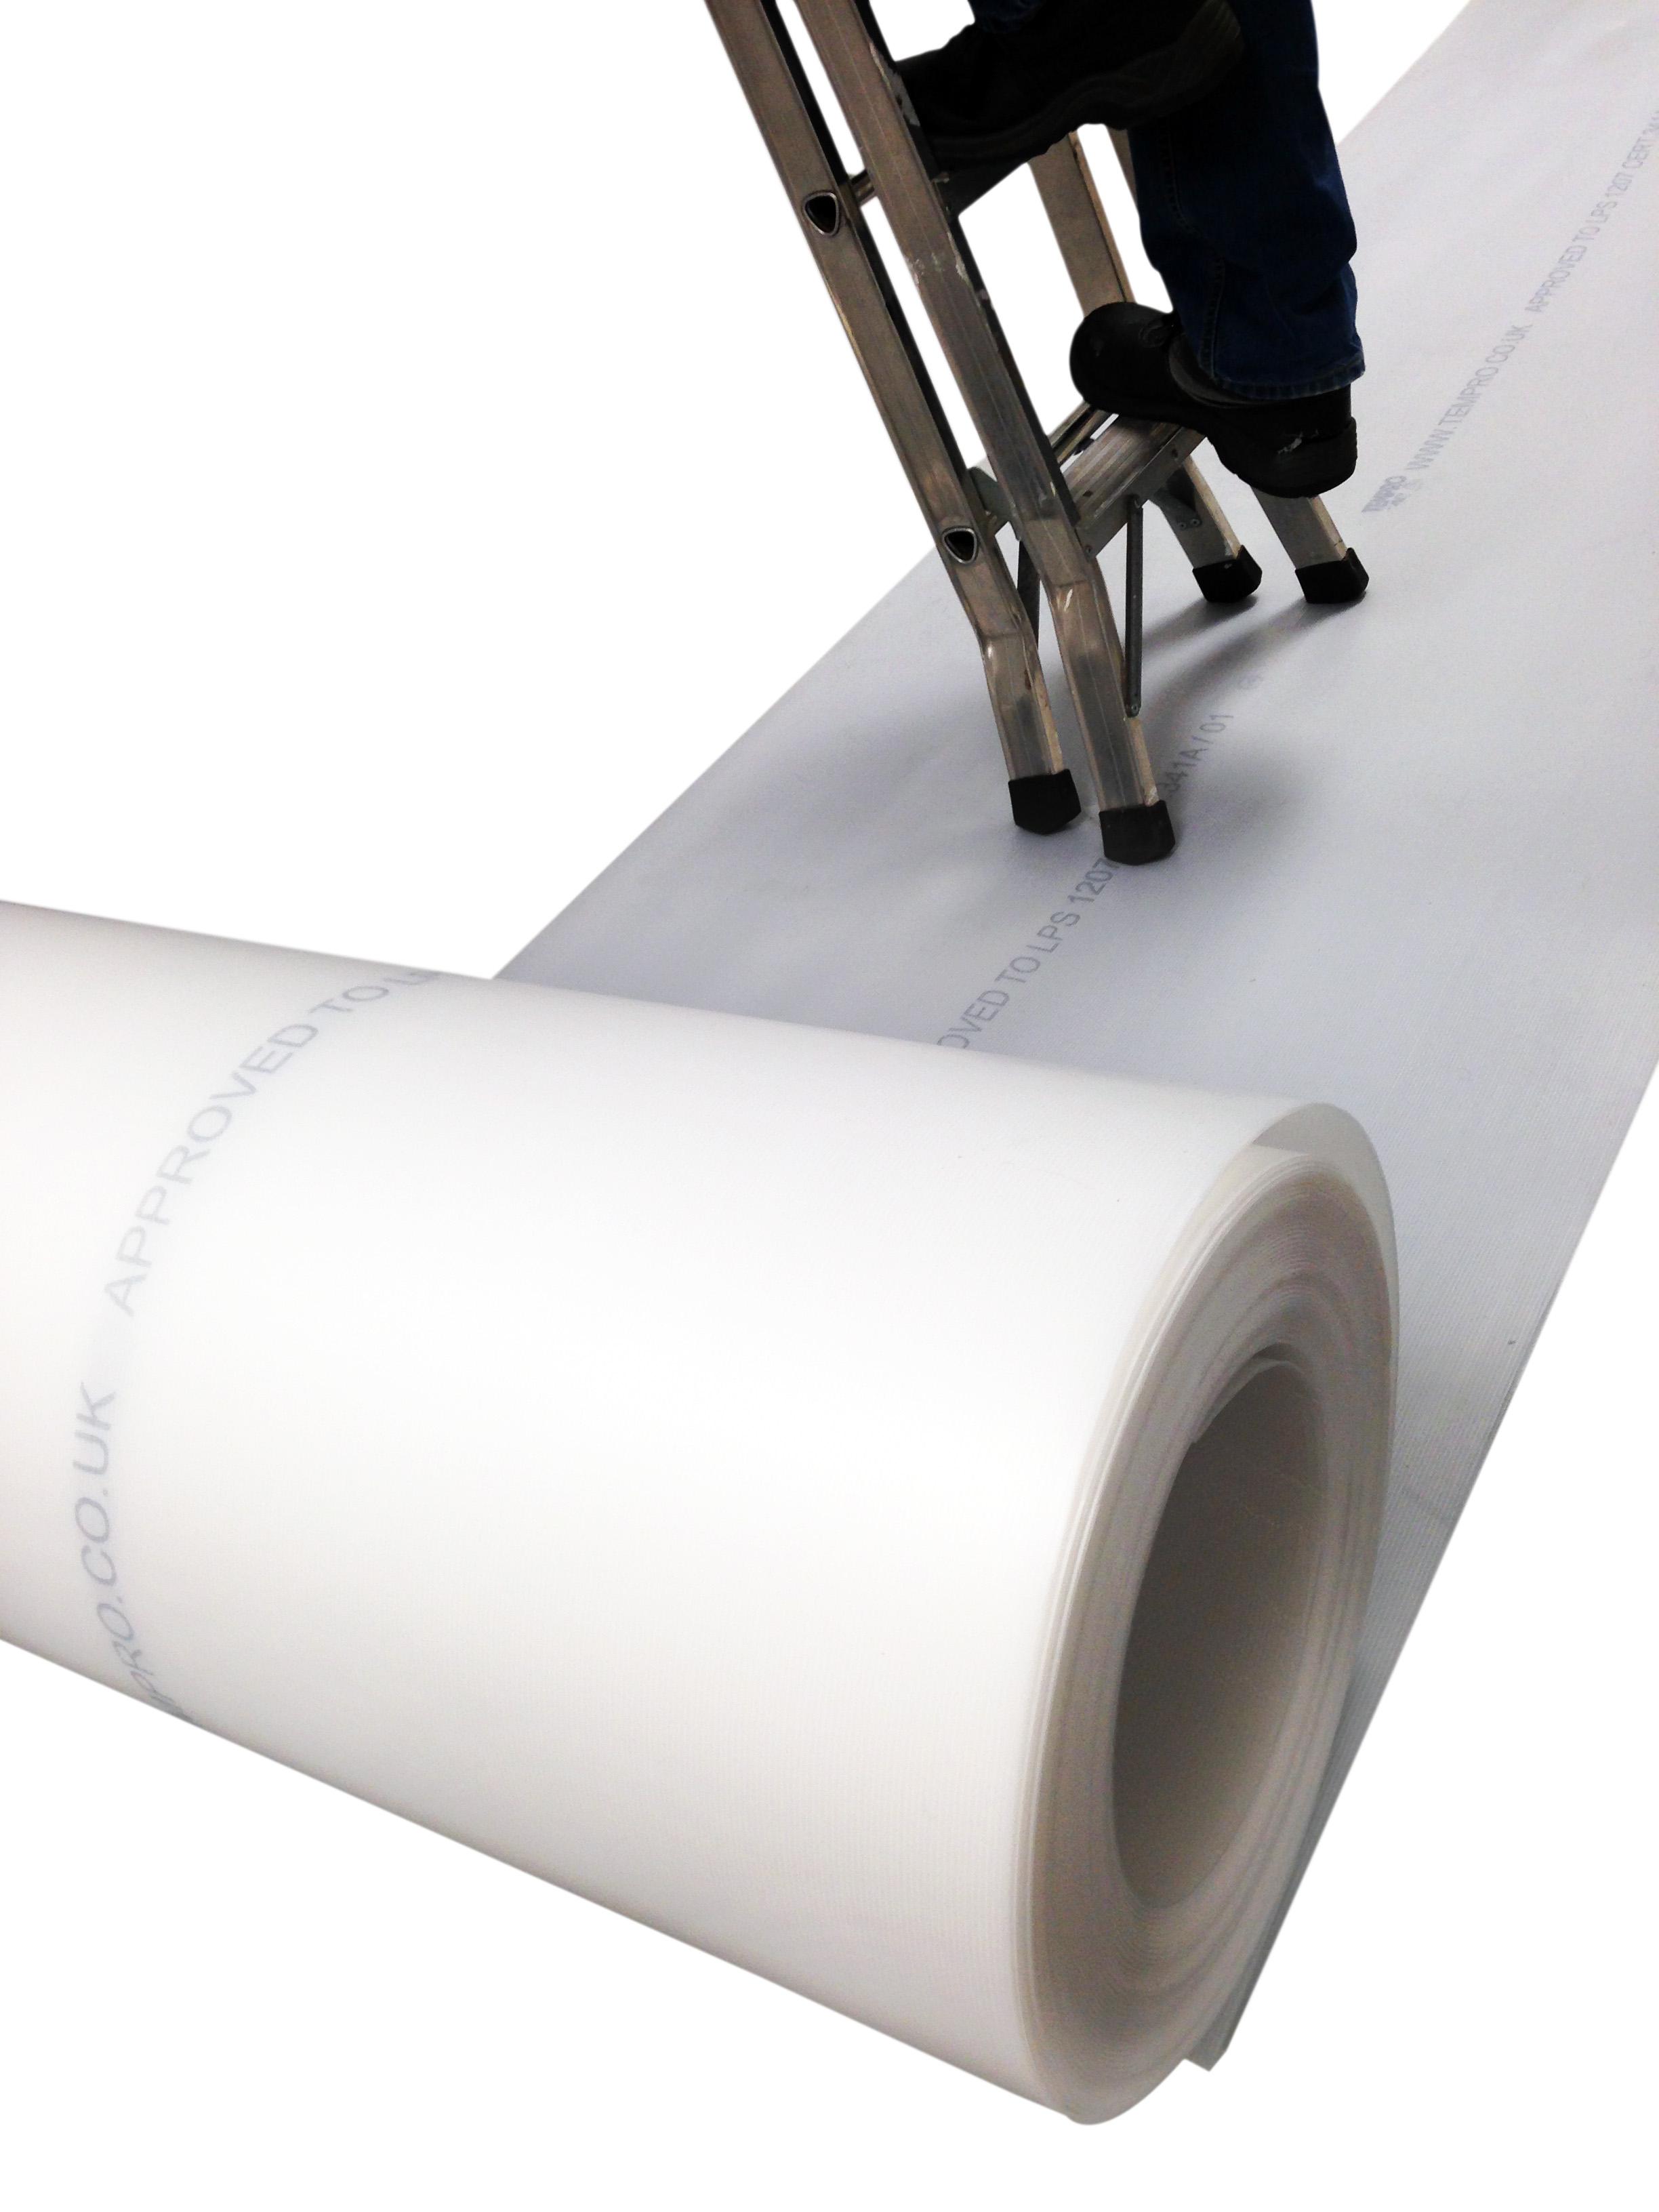 Correx Corrugated Plastic Floor Protection Fire Retardant